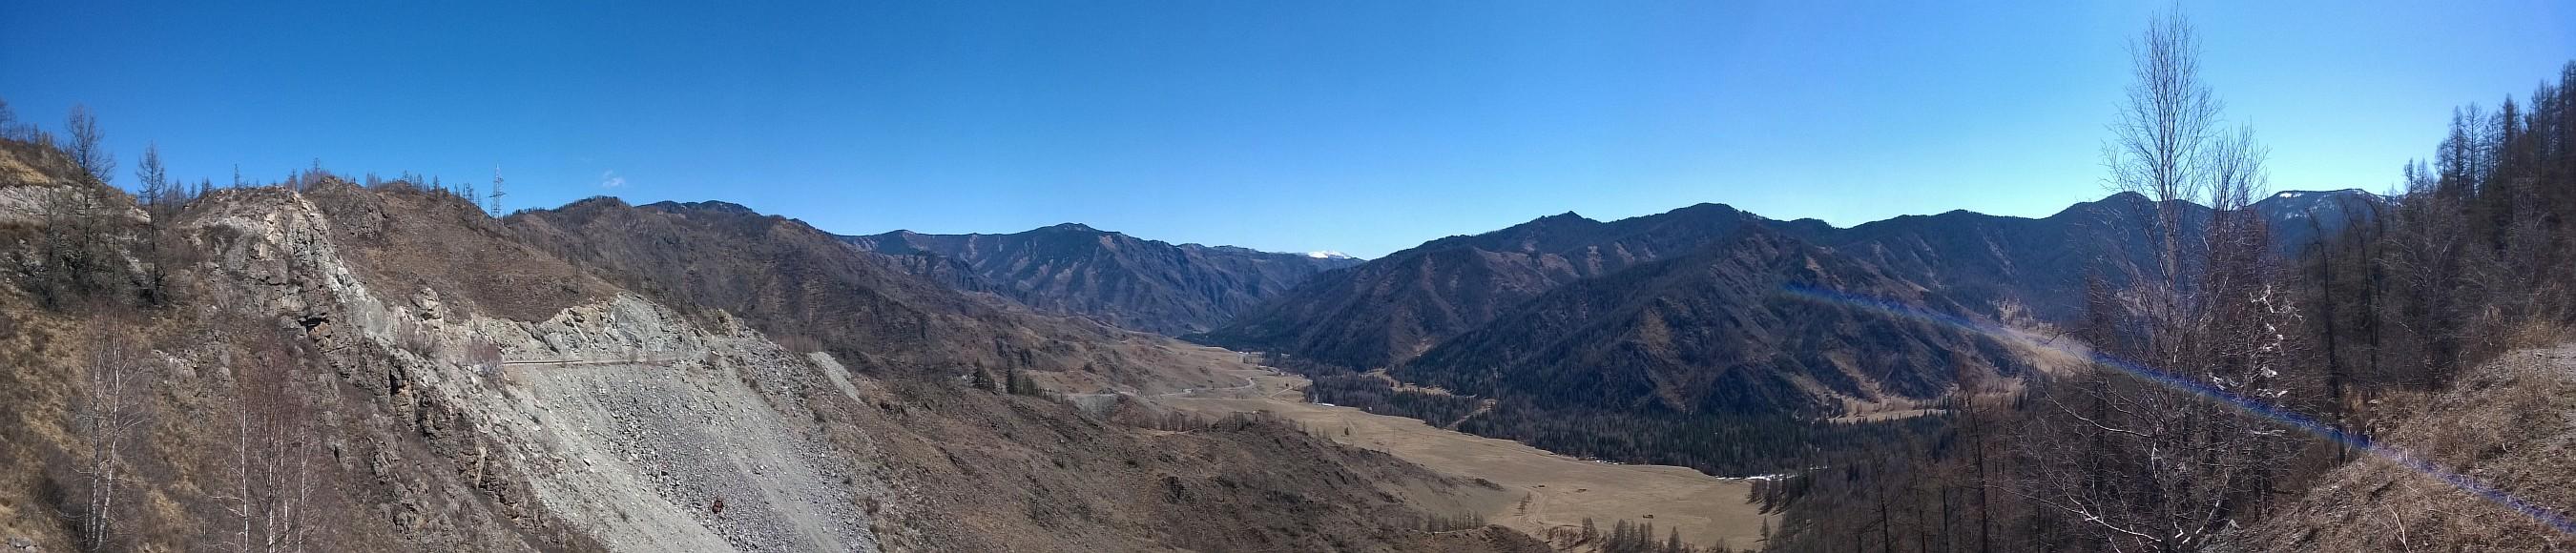 Панорама, Алтай, горы, природа, путешествия, фотография, Аксанов Нияз, kukmor, жж, красота, Катунь, Чуя, река, of WP_20140427_09_33_51_Panorama